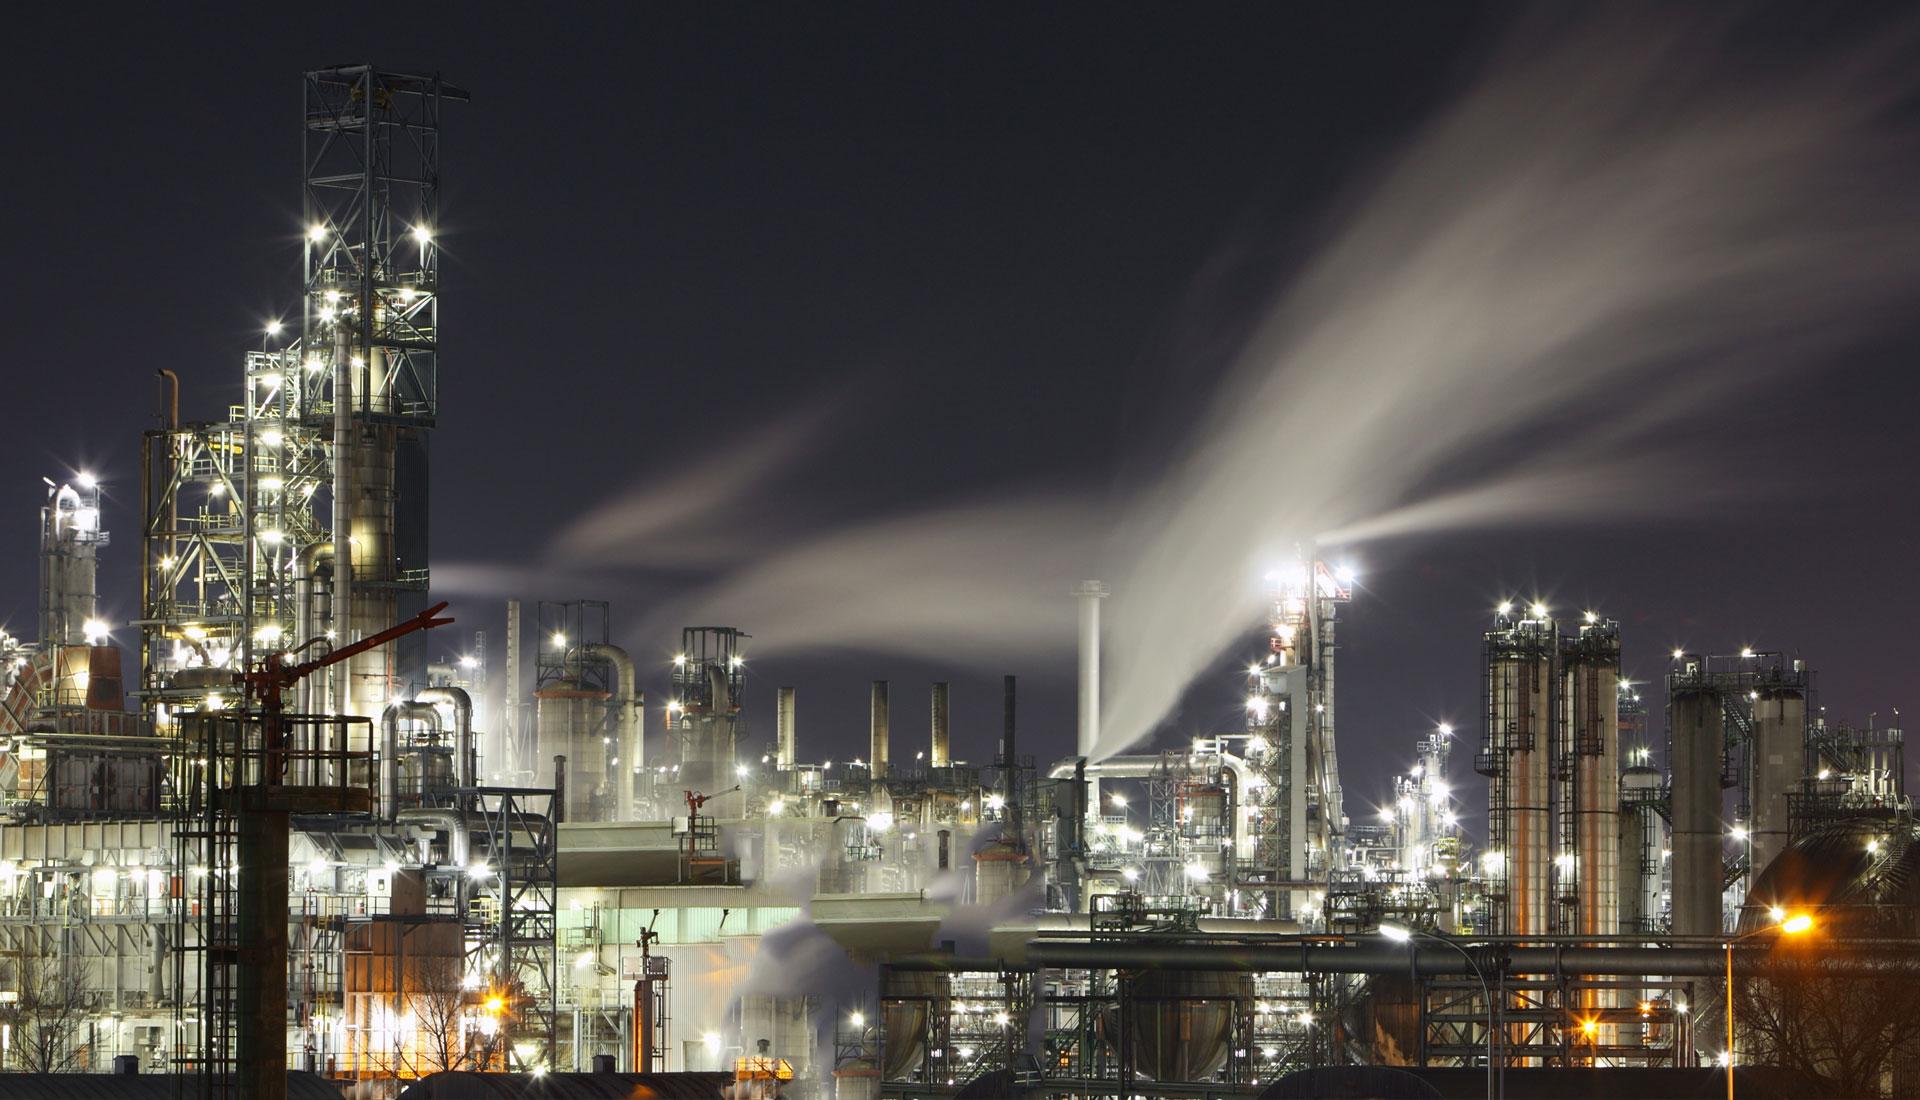 SELFCI : Electricité - Froid - Climatisation industrielle